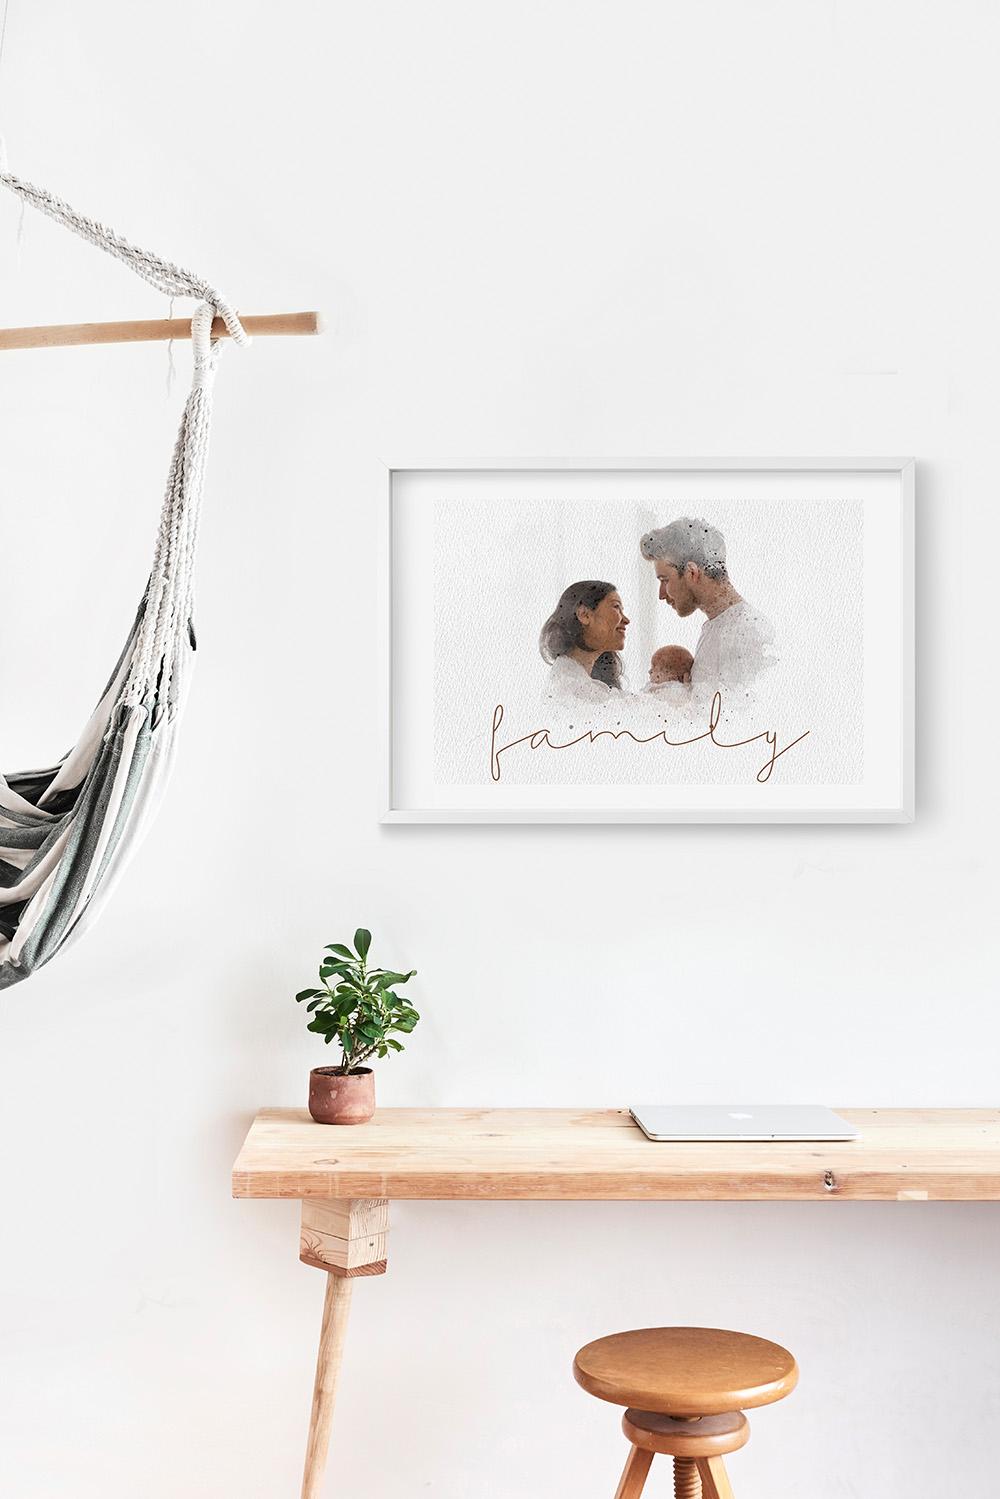 Blog-Adventskalender Britta-Passmann-Fotografie-Dortmund-Neugeborenenfotos-Newbornfotos-Babyfotos-Fotoshooting_Aquarell_Print